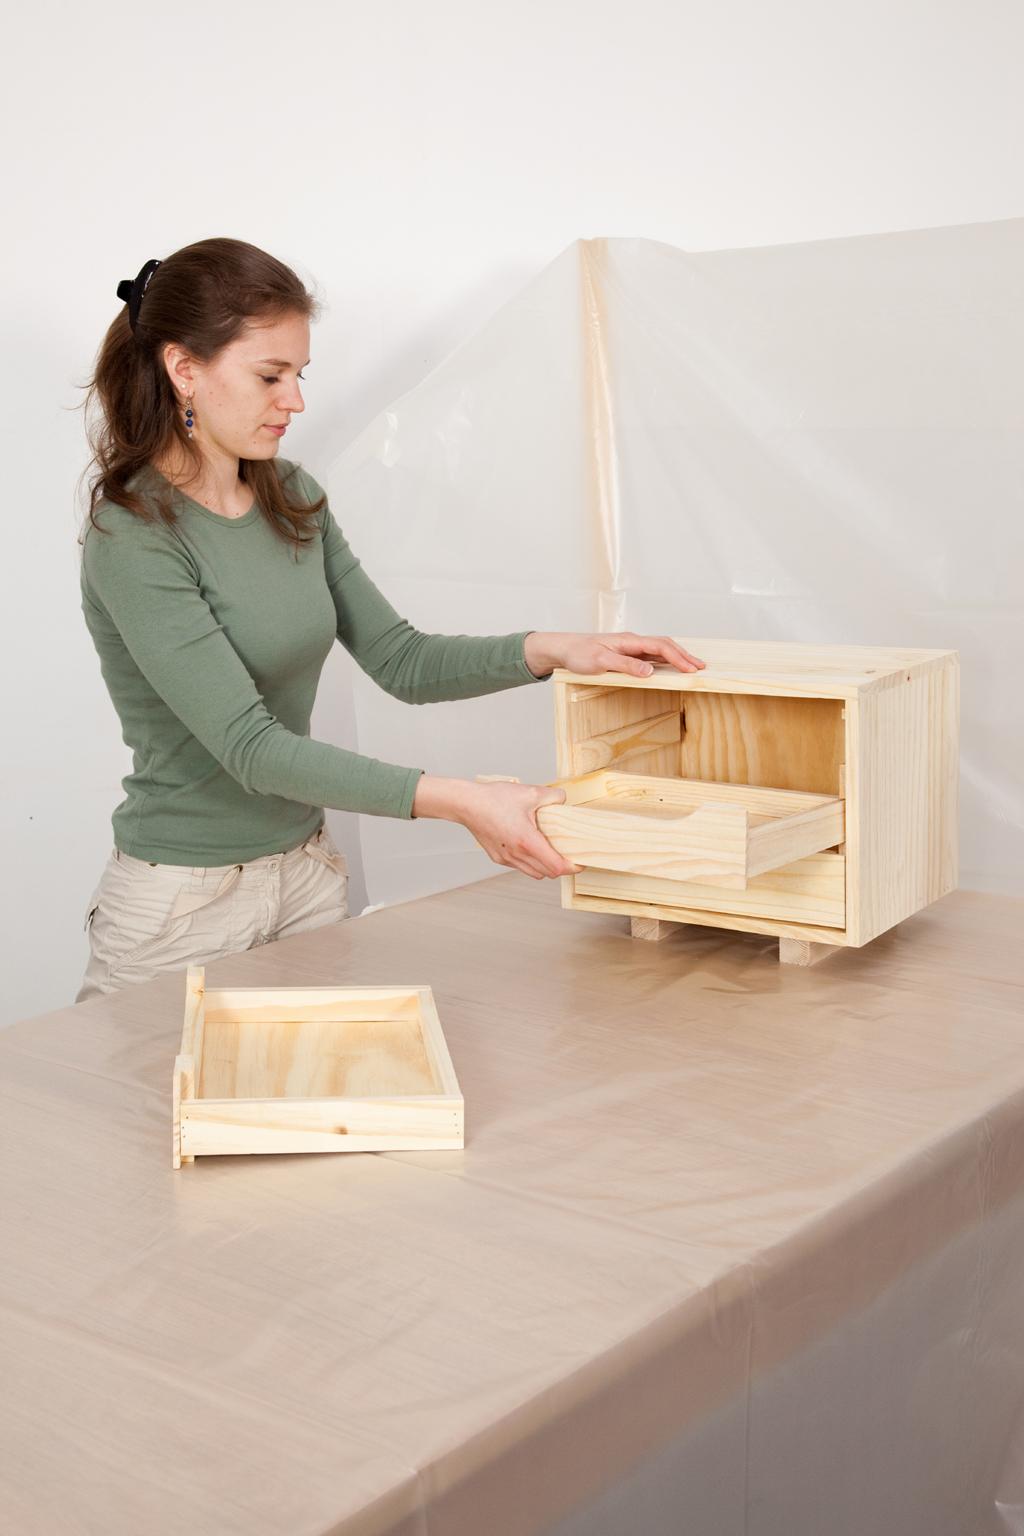 Peindre un meuble la bombe diy family - Peindre meuble bombe ...